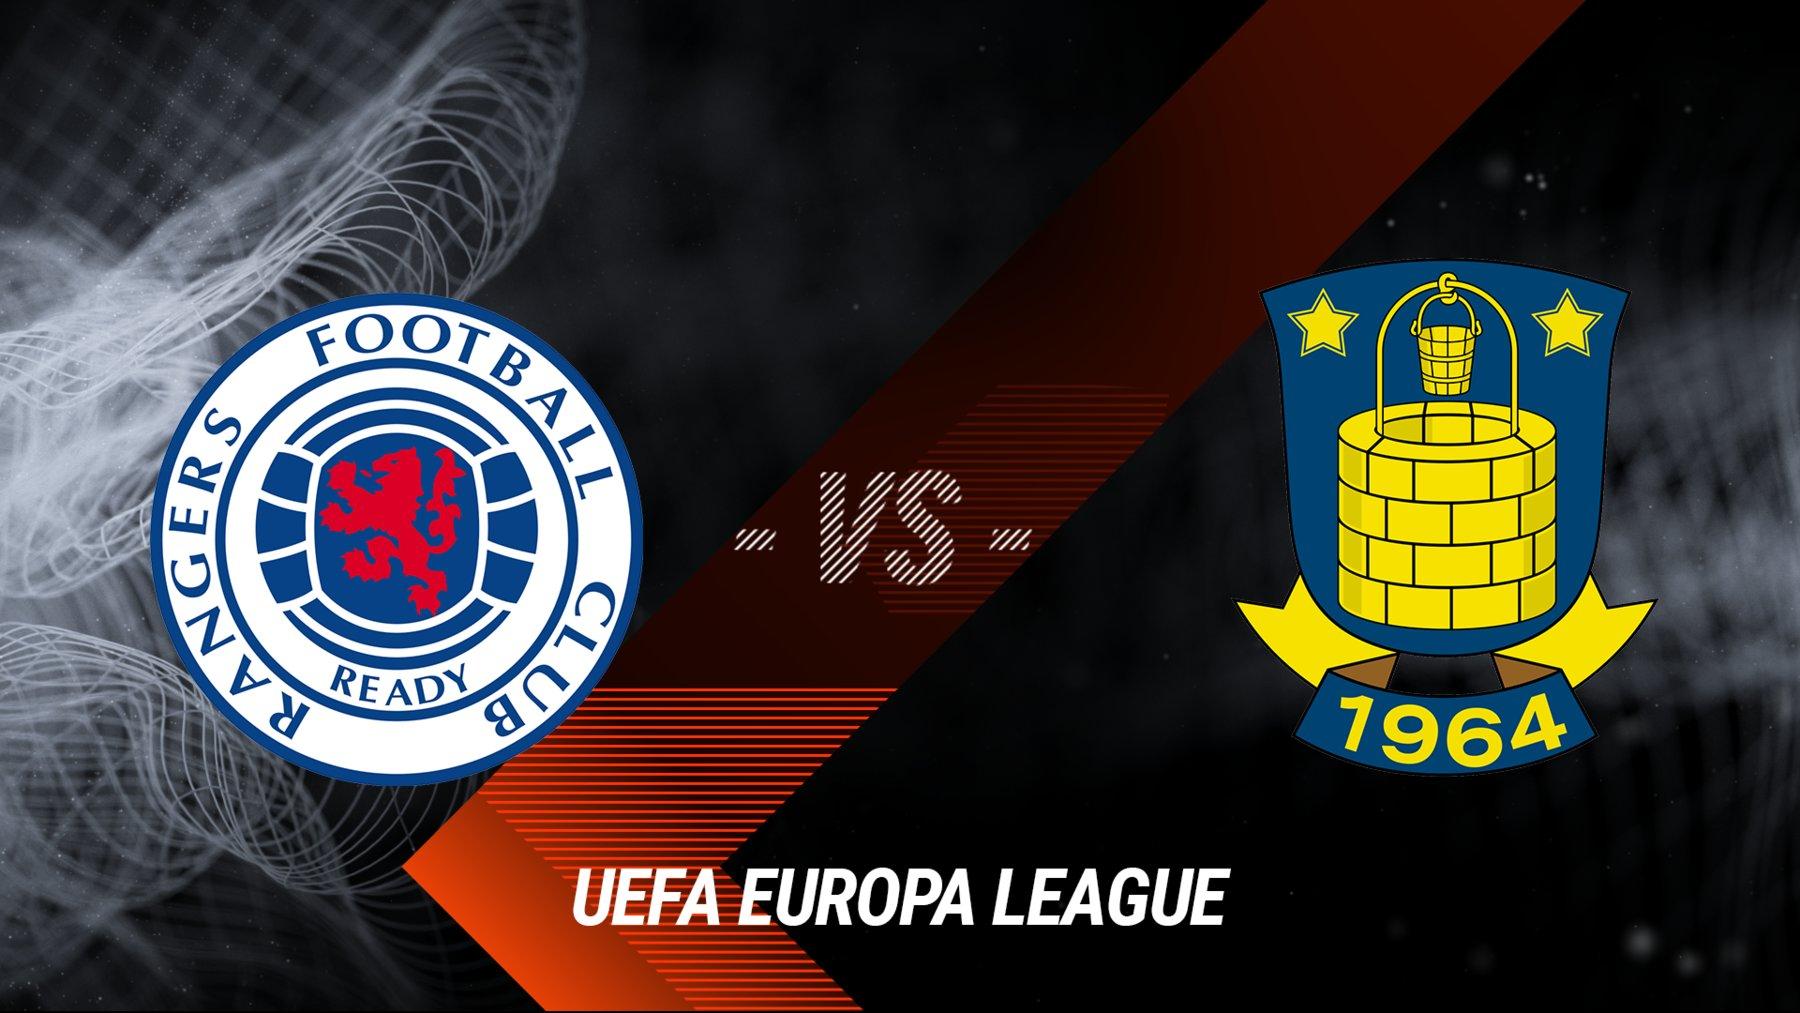 Glasgow Rangers vs. Bröndby IF